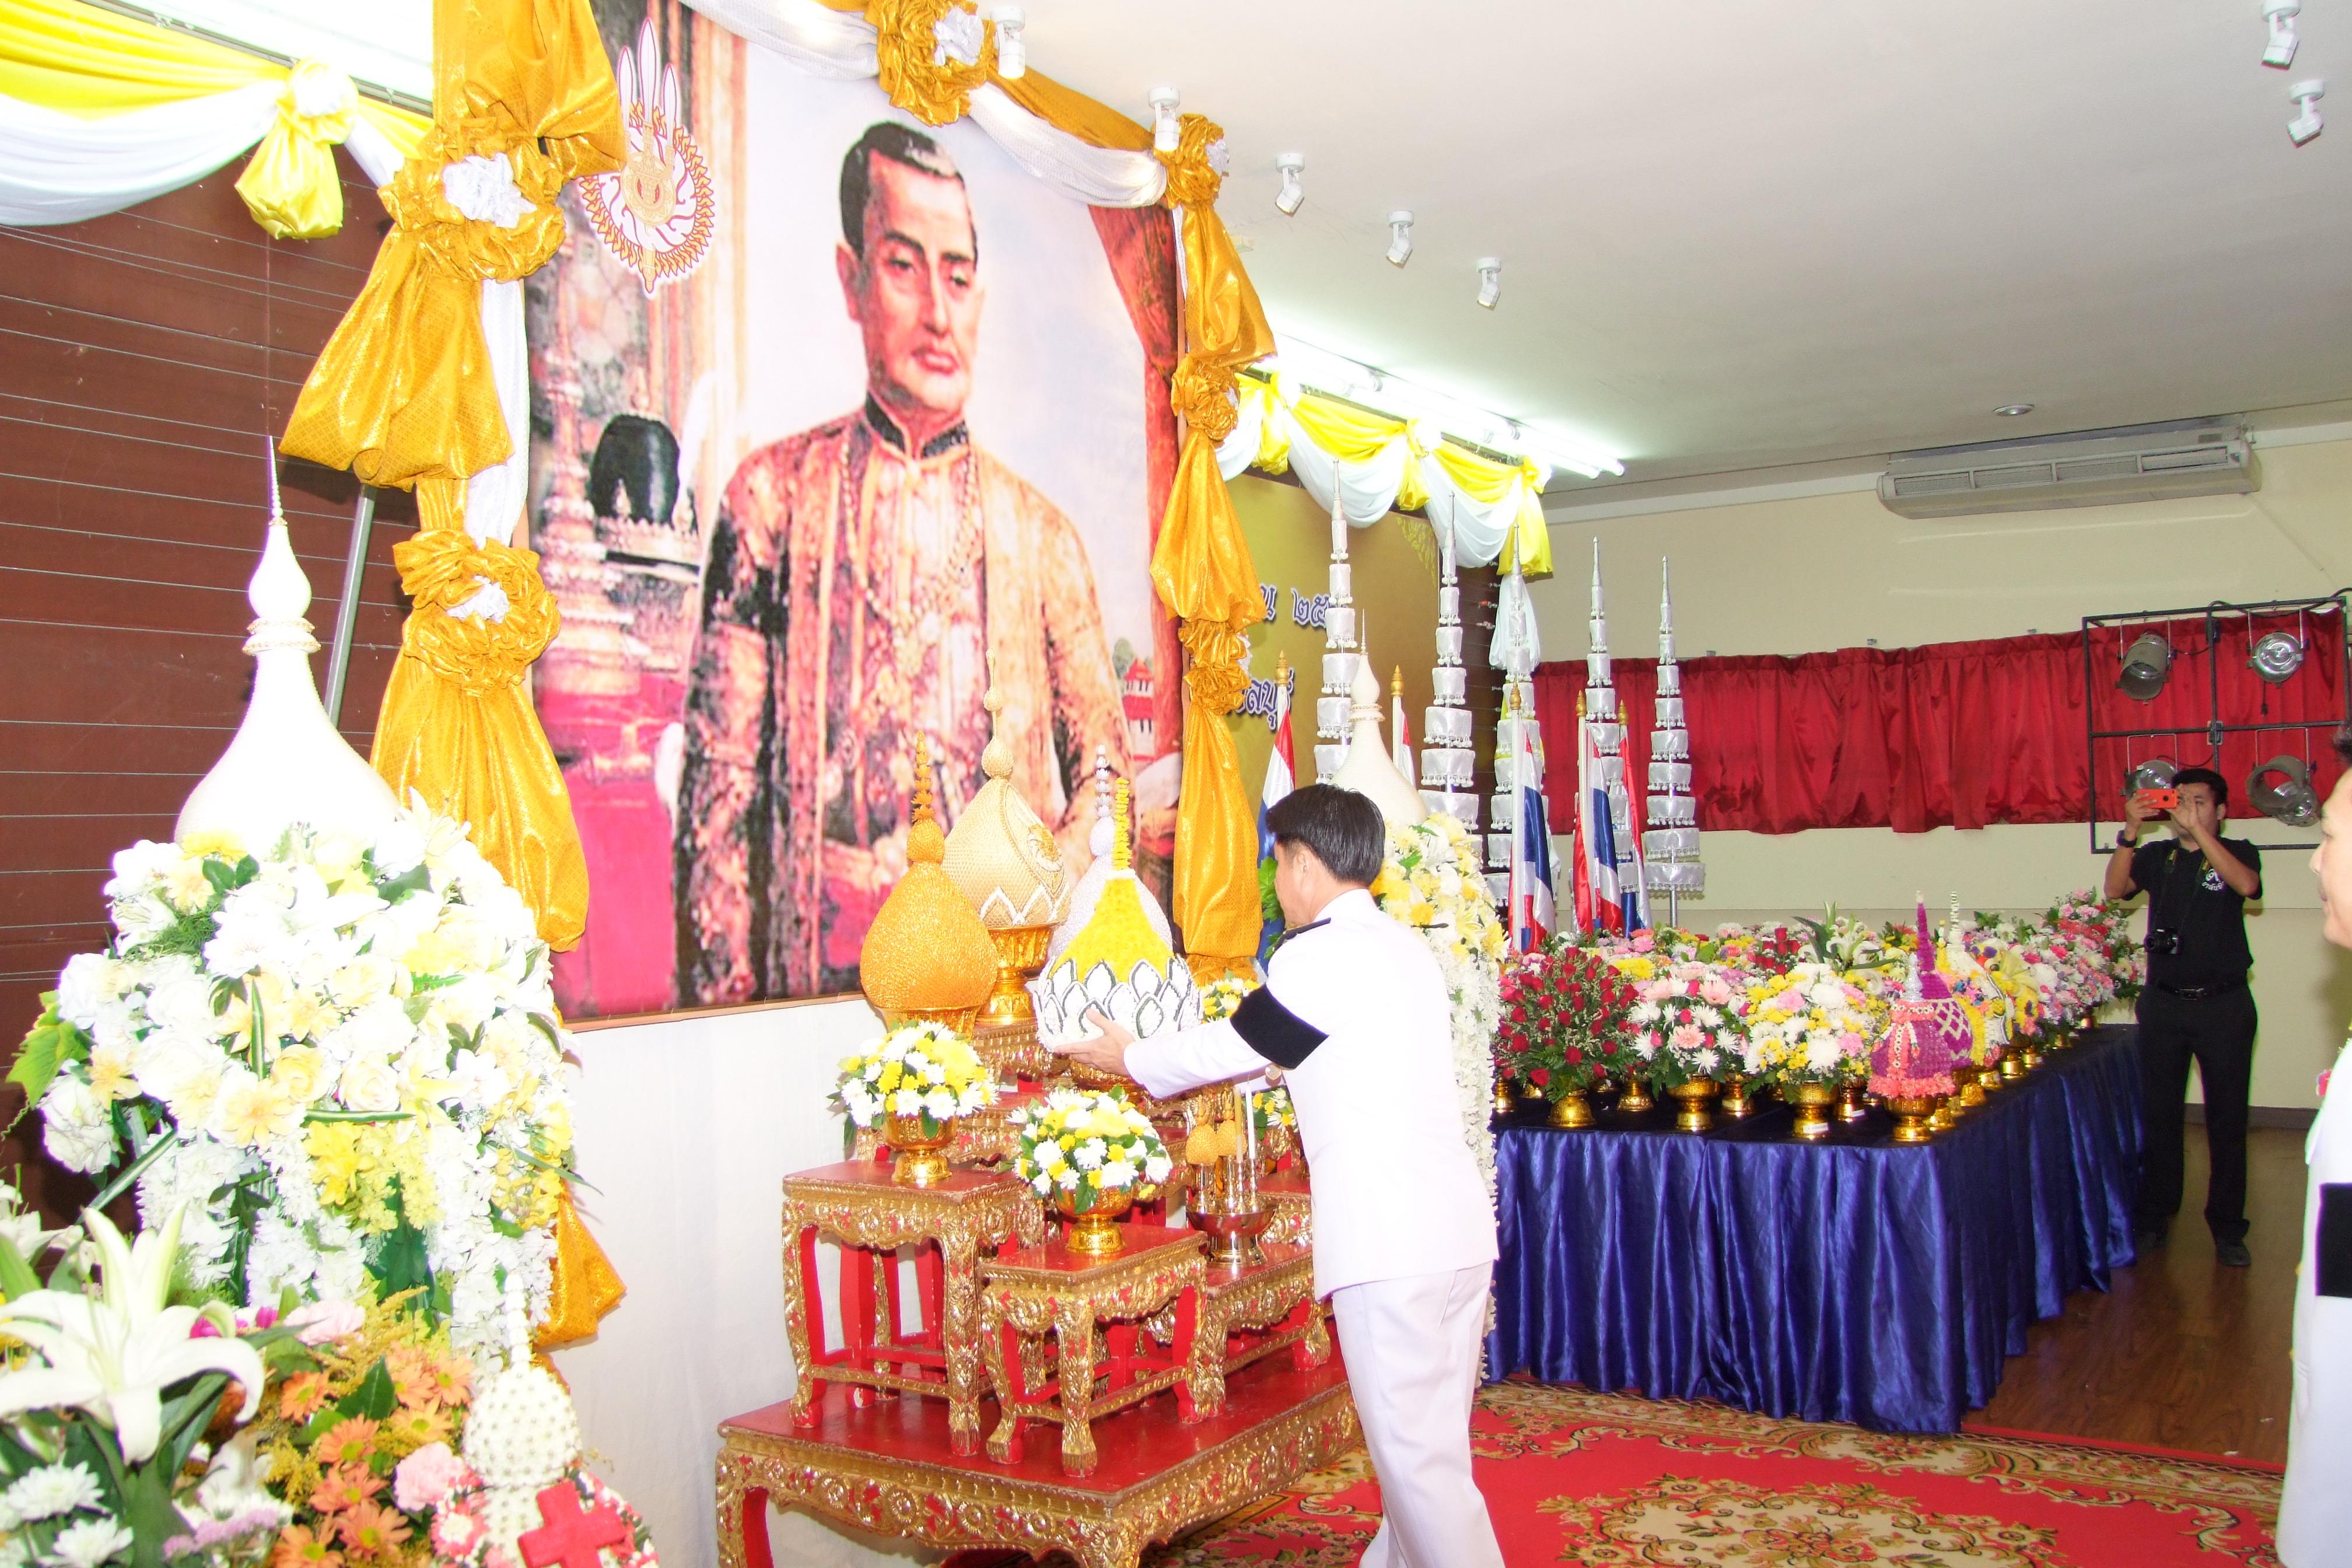 Chonburi Gov. Pakarathorn Thienchai led the province's Chakri Day celebration, honoring the founding of the current royal dynasty.